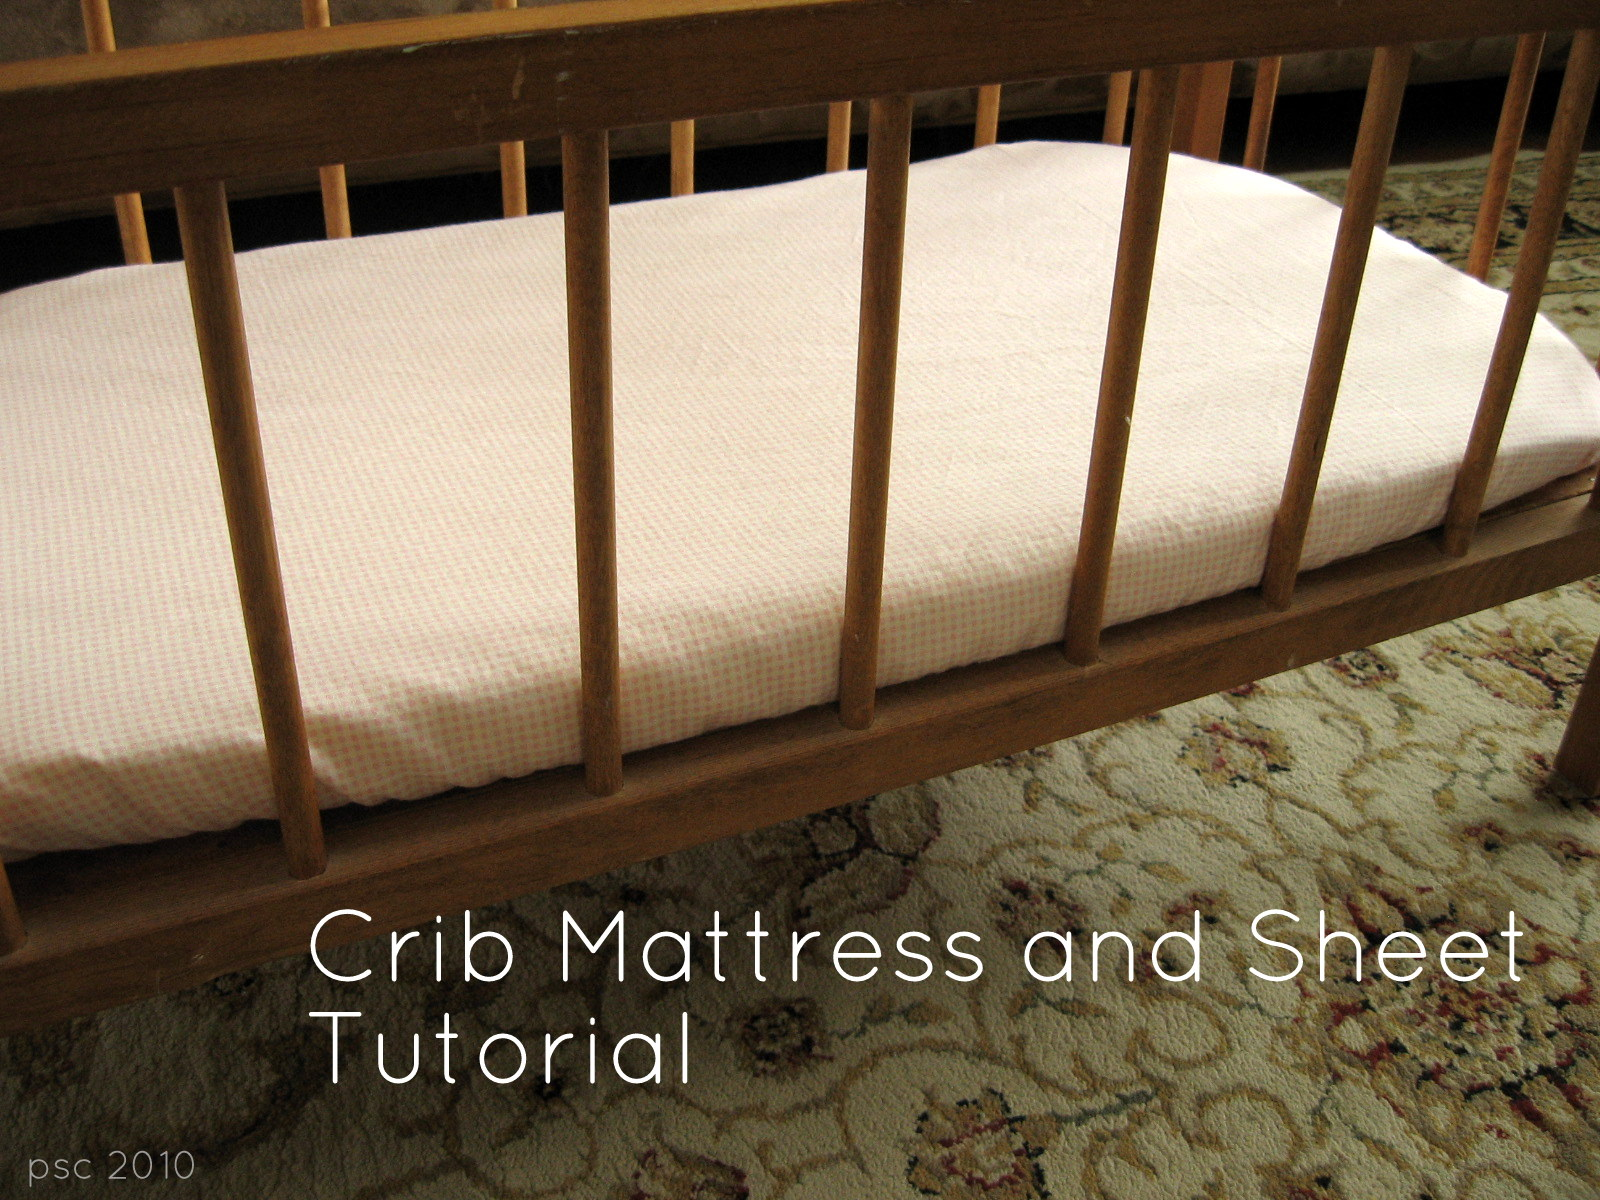 Pickup Some Creativity Doll Crib Mattress And Sheet Tutorial